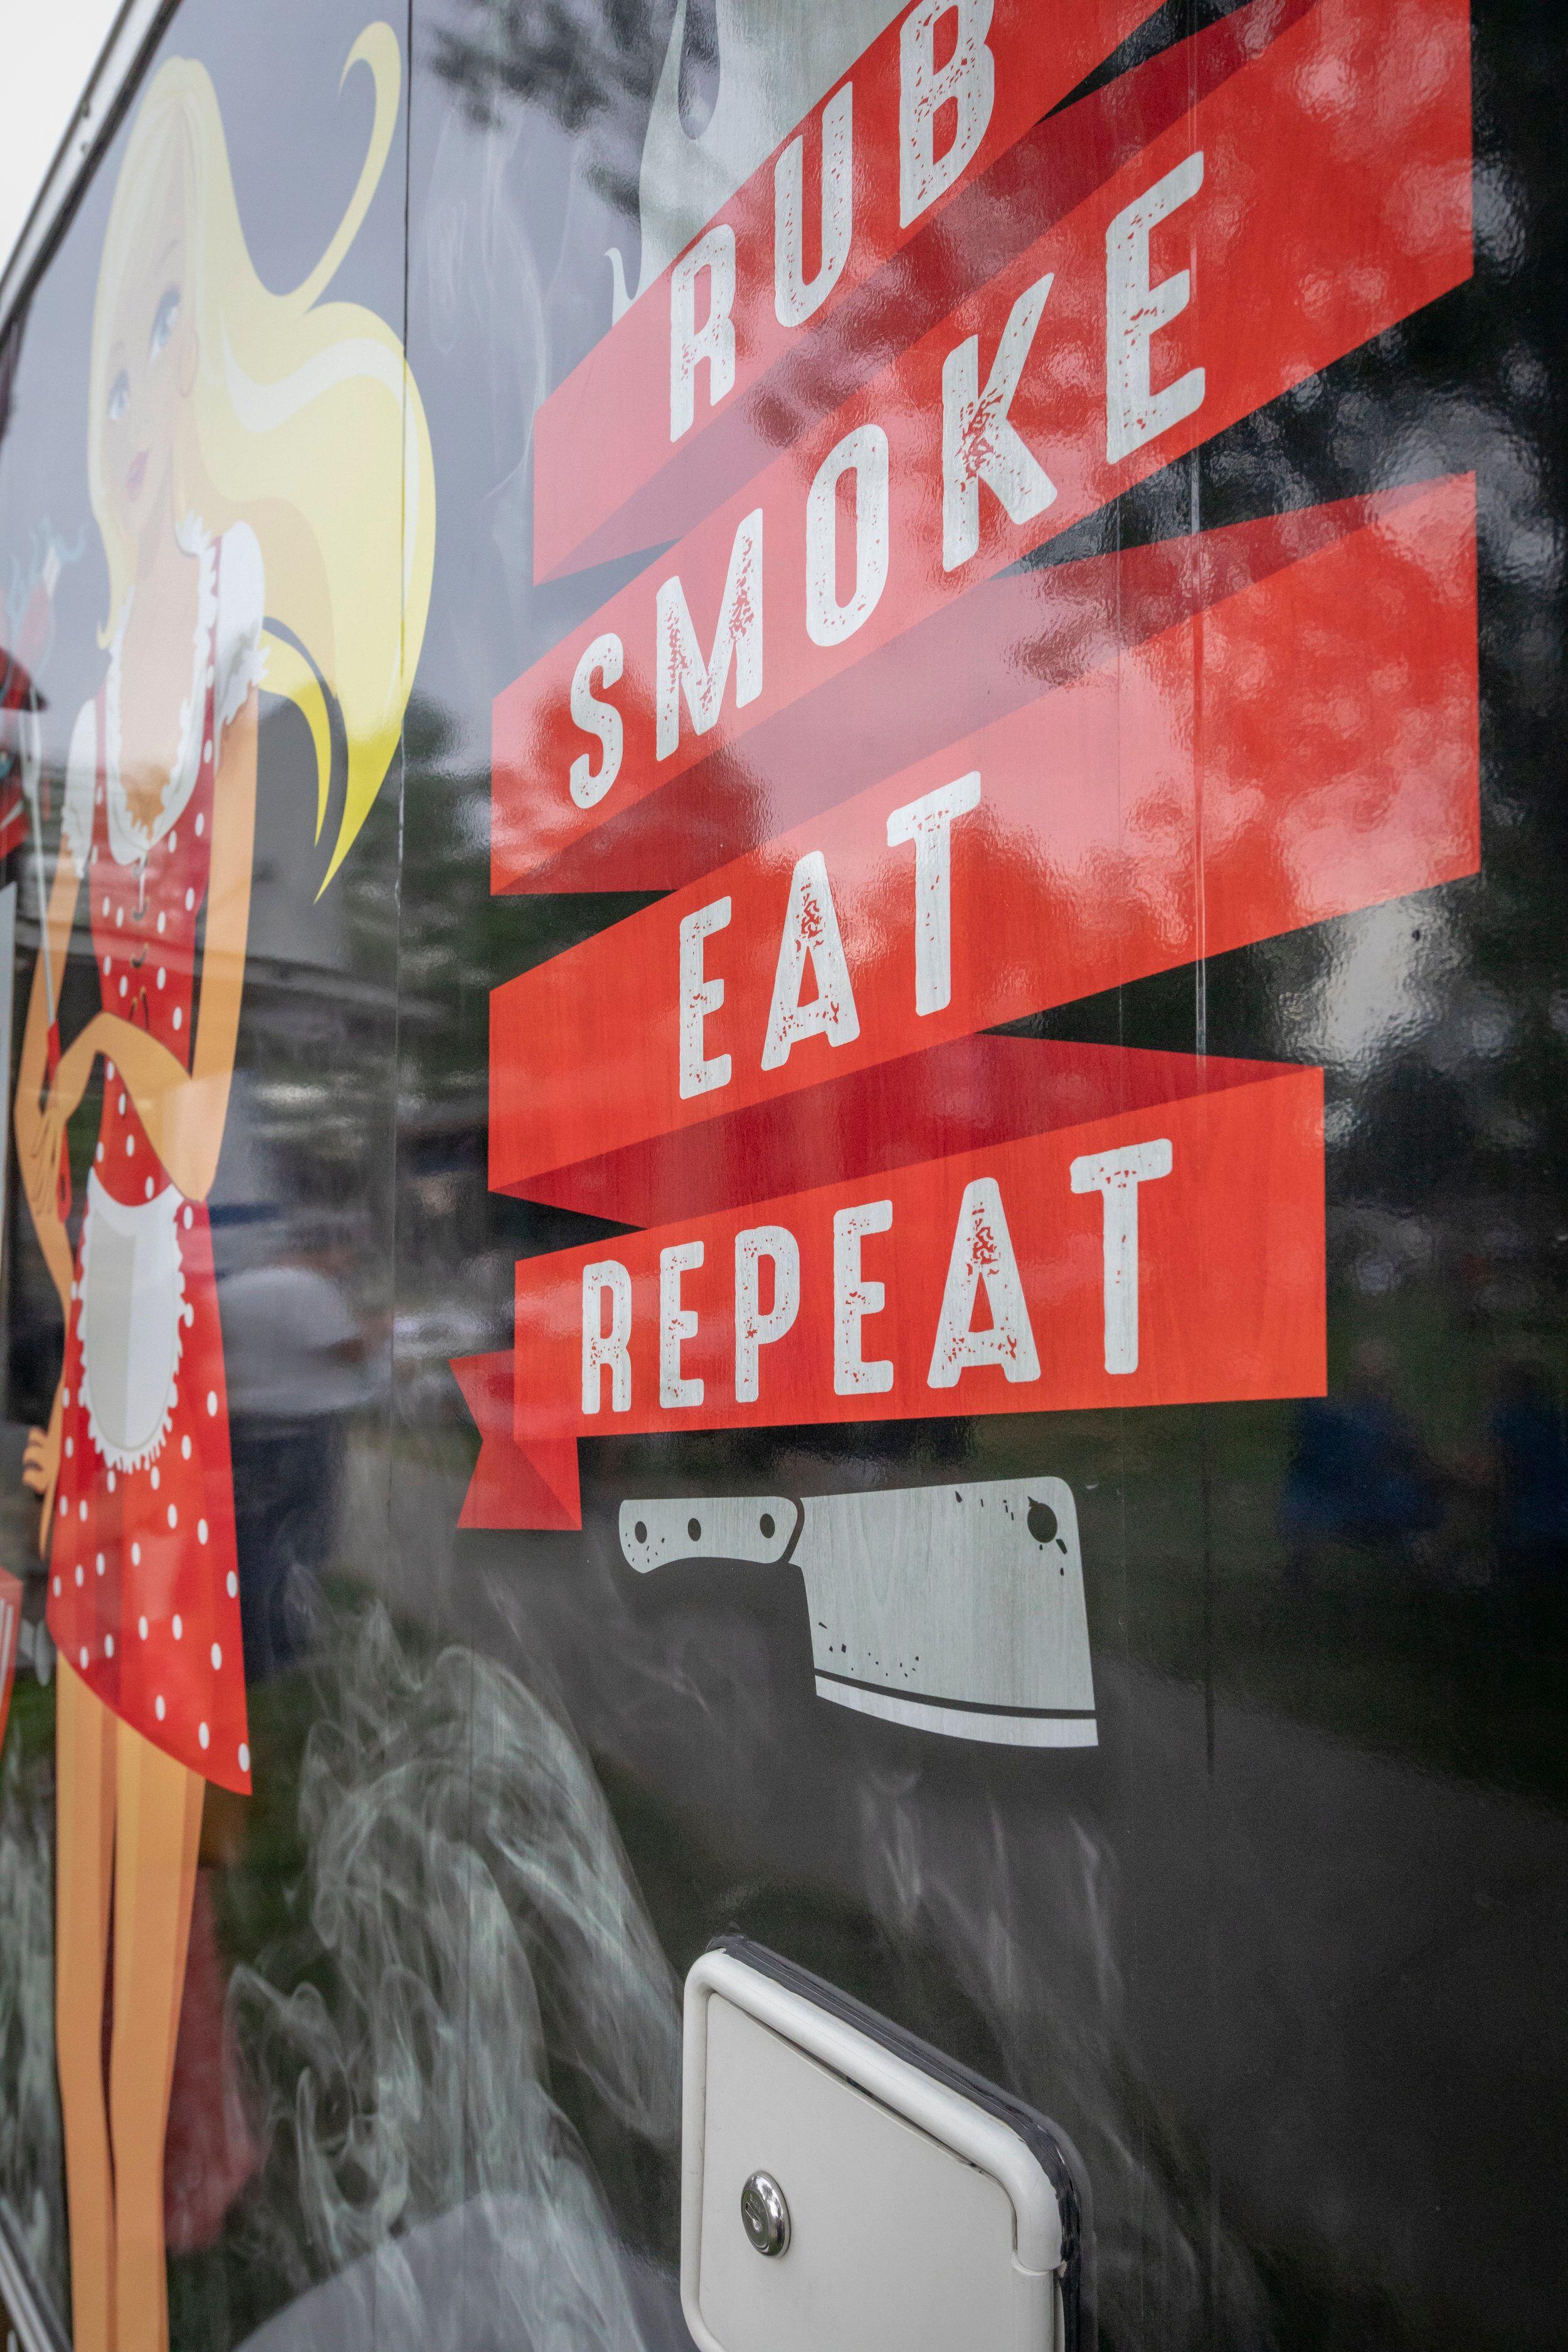 rub smoke eat repeat.jpeg